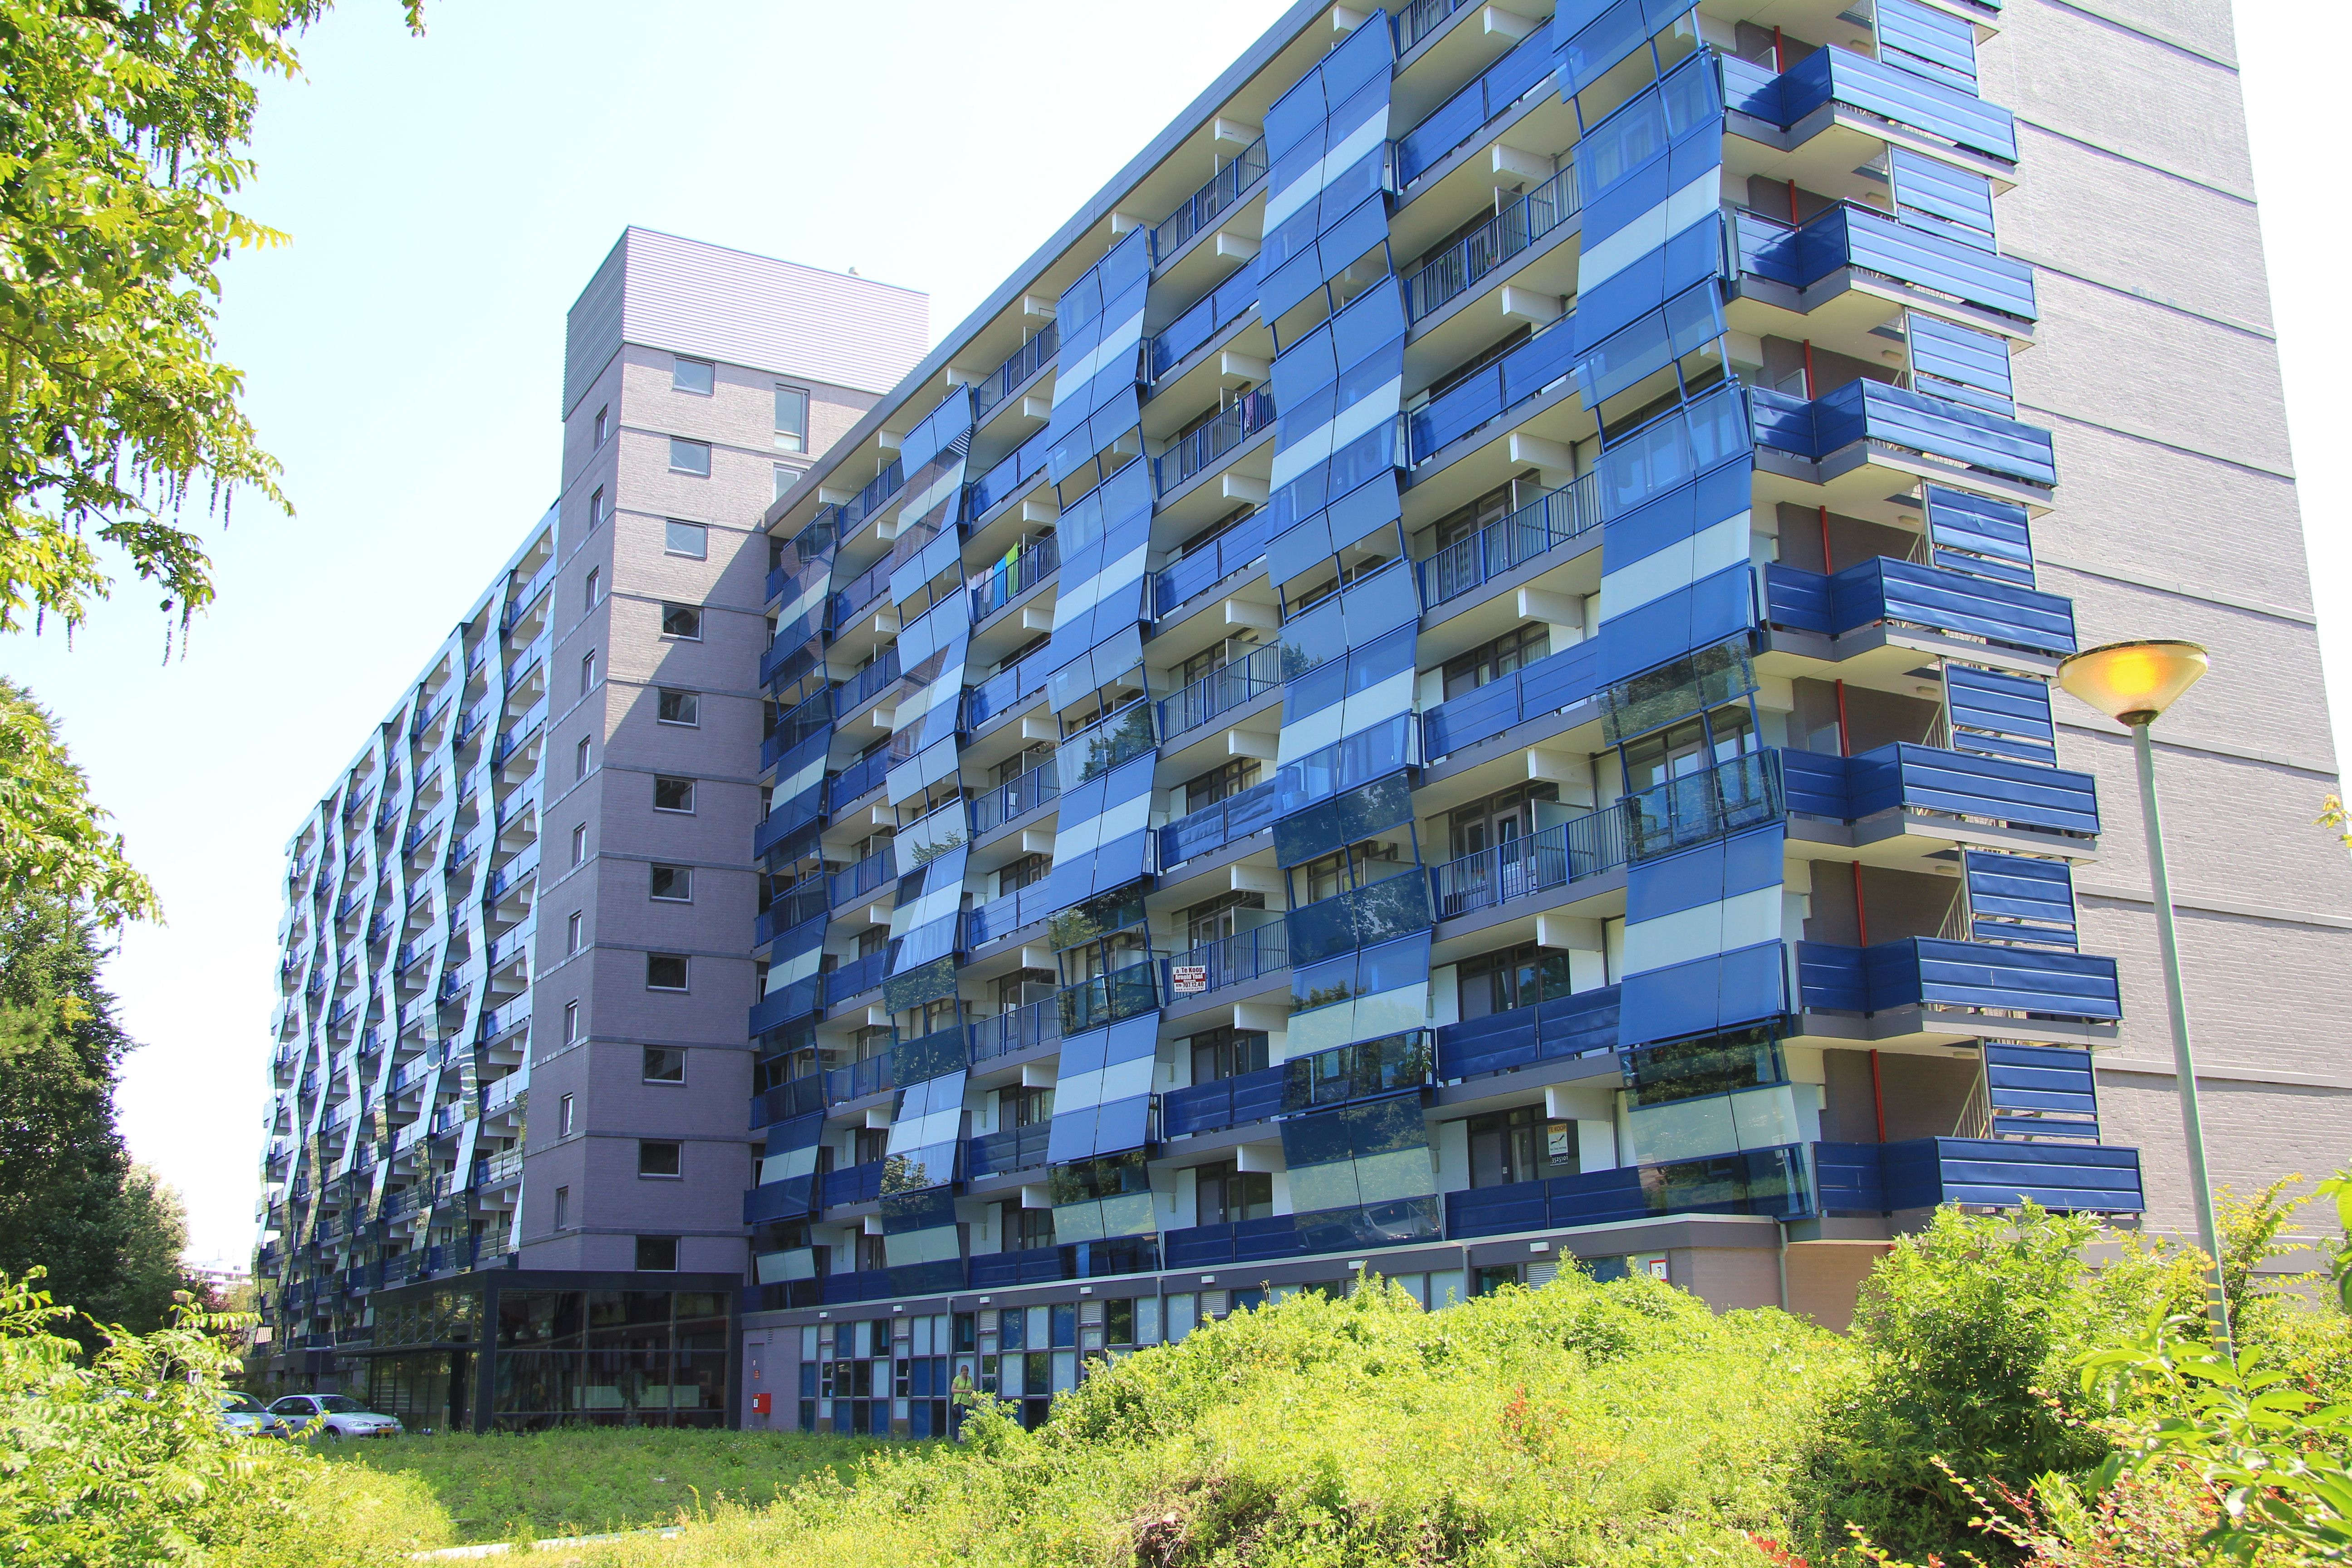 Gevels rijswijkse flats krijgen kleur » bouwwereld.nl